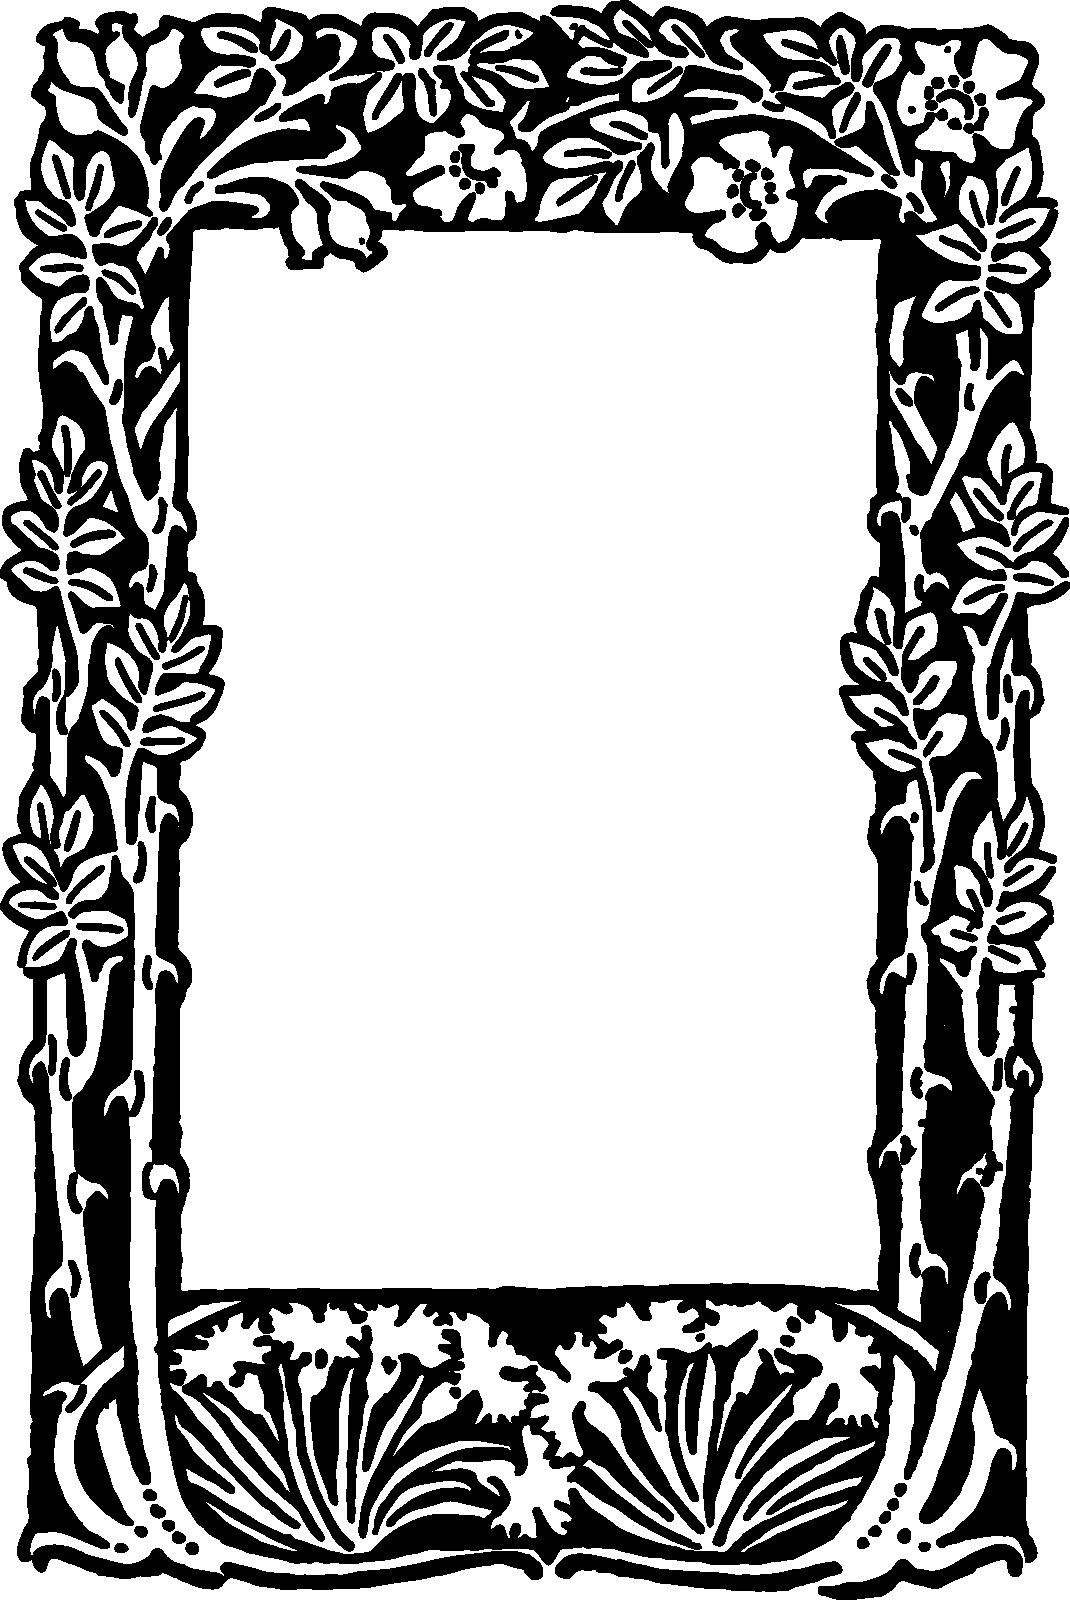 86587 Text Dividers Set Vectors also Design 20clipart 20borders further 170 Ornamentos Mega Pack Divisores Marcos Esquinas Bordes Y Ms additionally Vector Vintage Antique Clock Face 8697614 further Occult Symbols Esoteric Designs. on vintage vector graphics